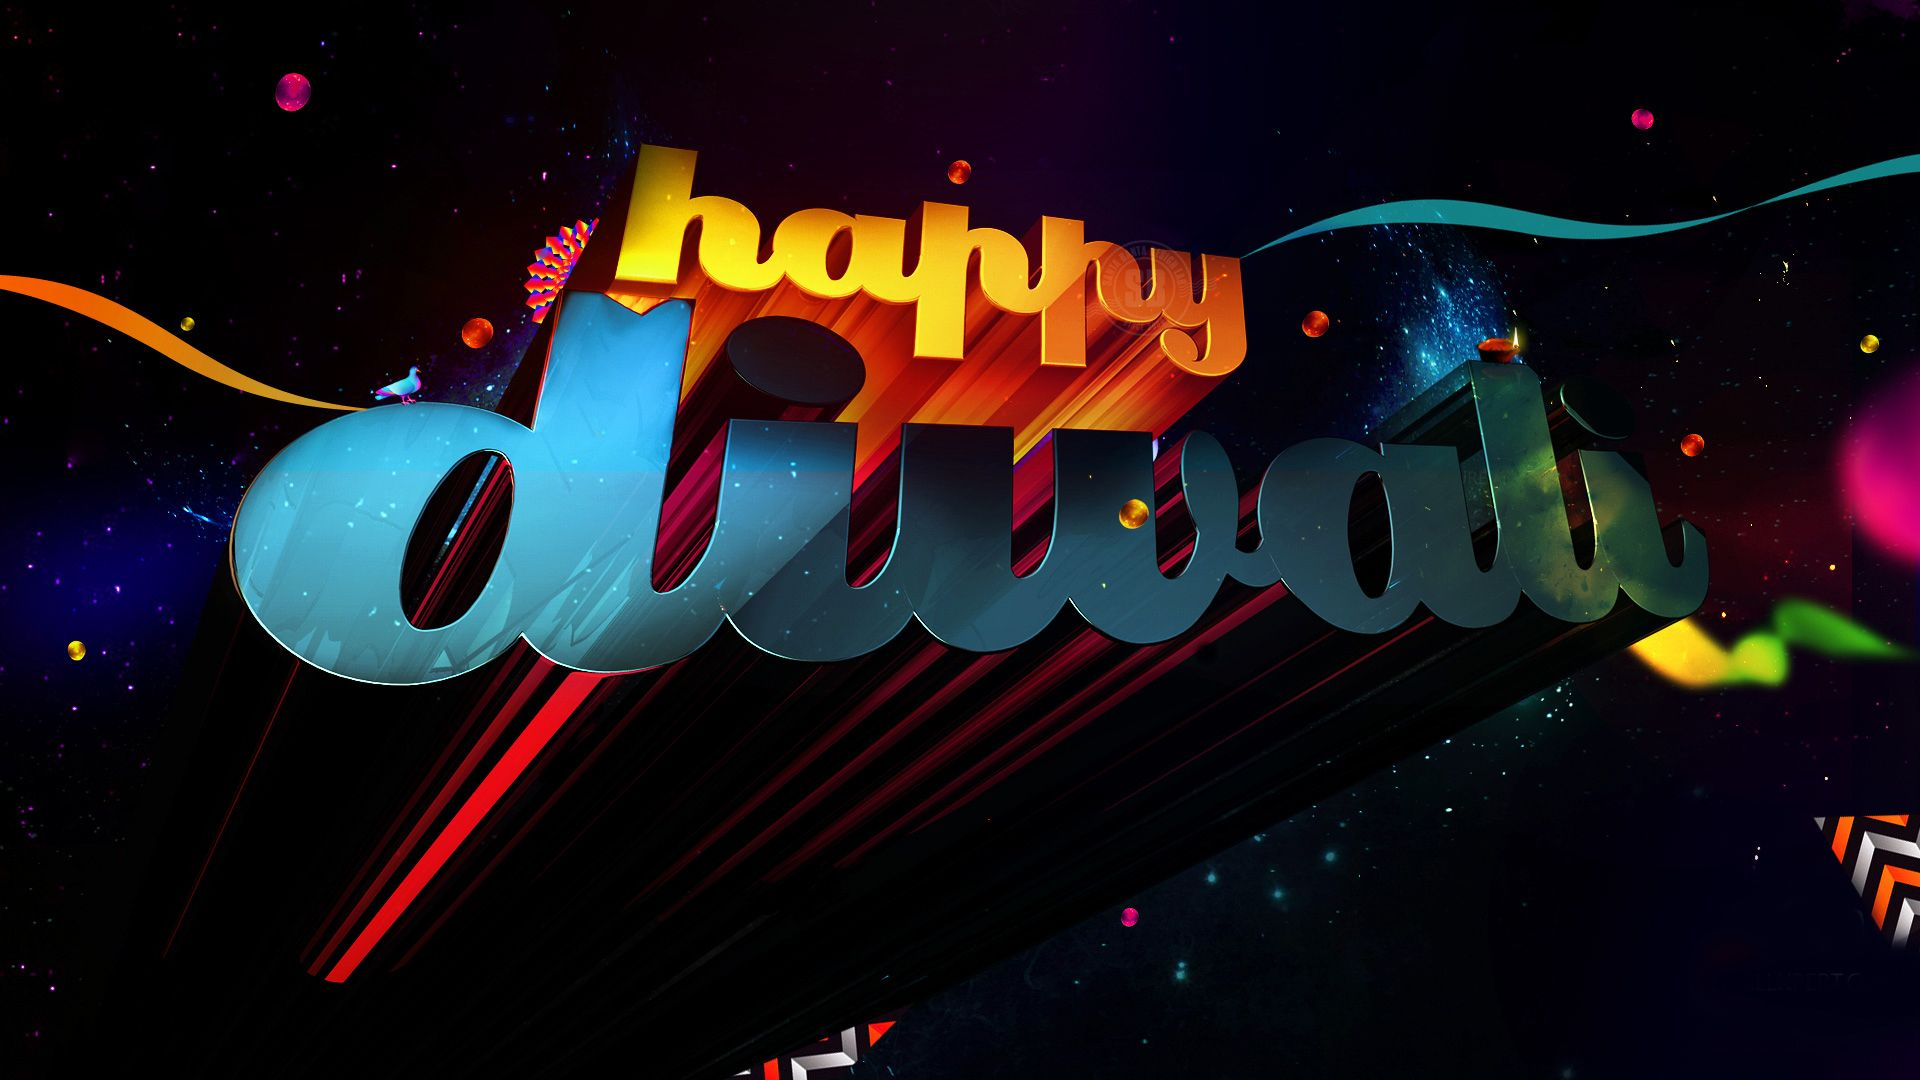 download the happy diwali 2015 3d wallpaper in hd, send diwali